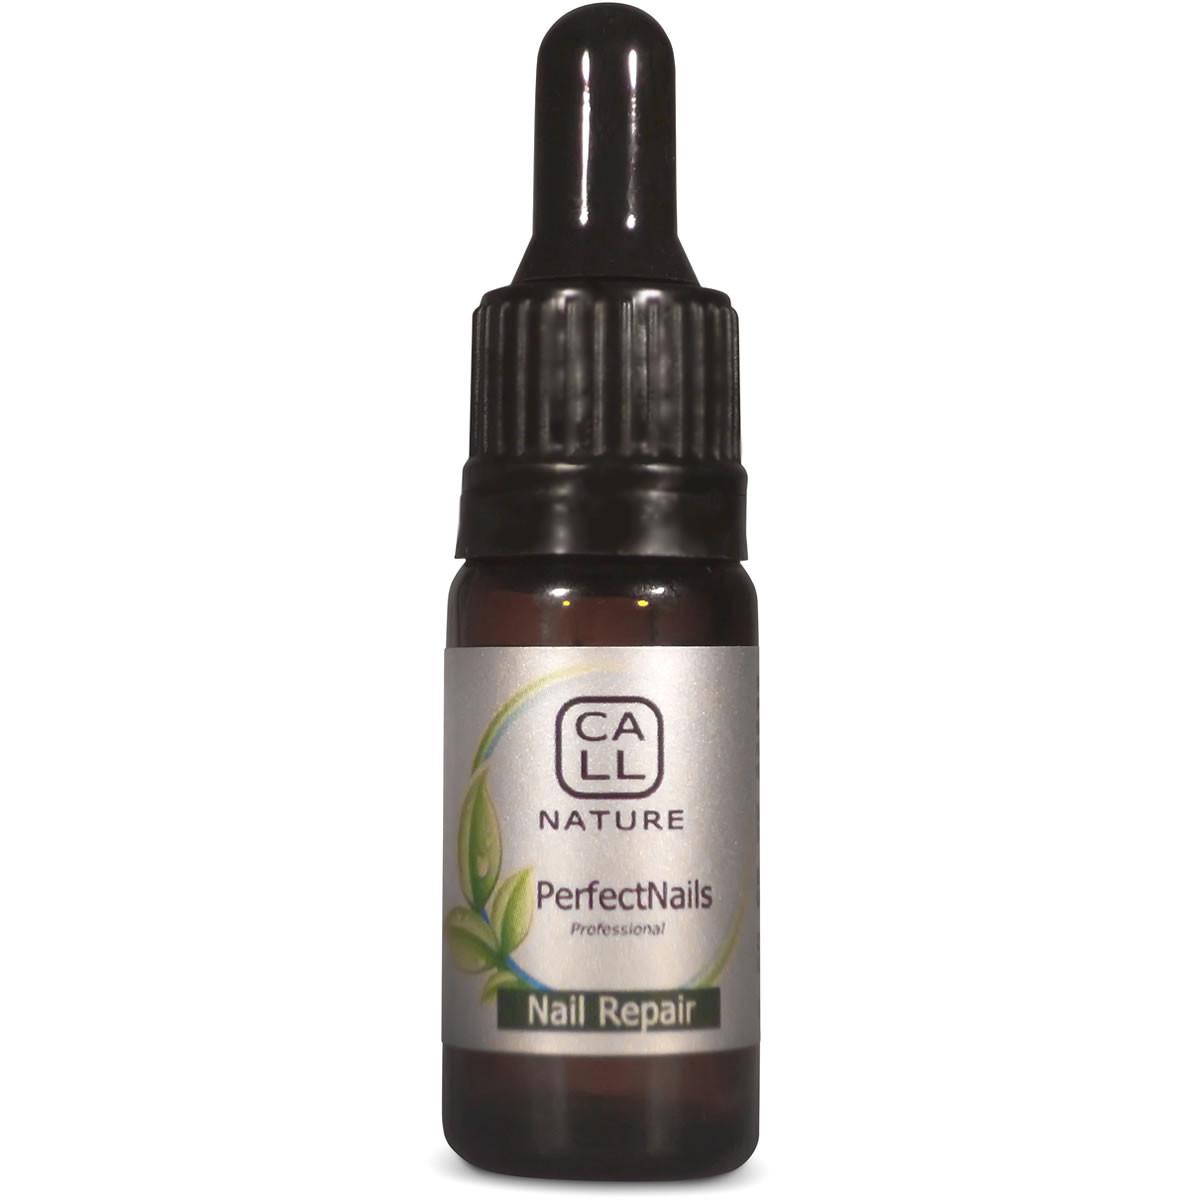 Pro Strong Nail Strengthener: Call Nature (Callnature.com) All Natural Cosmetics